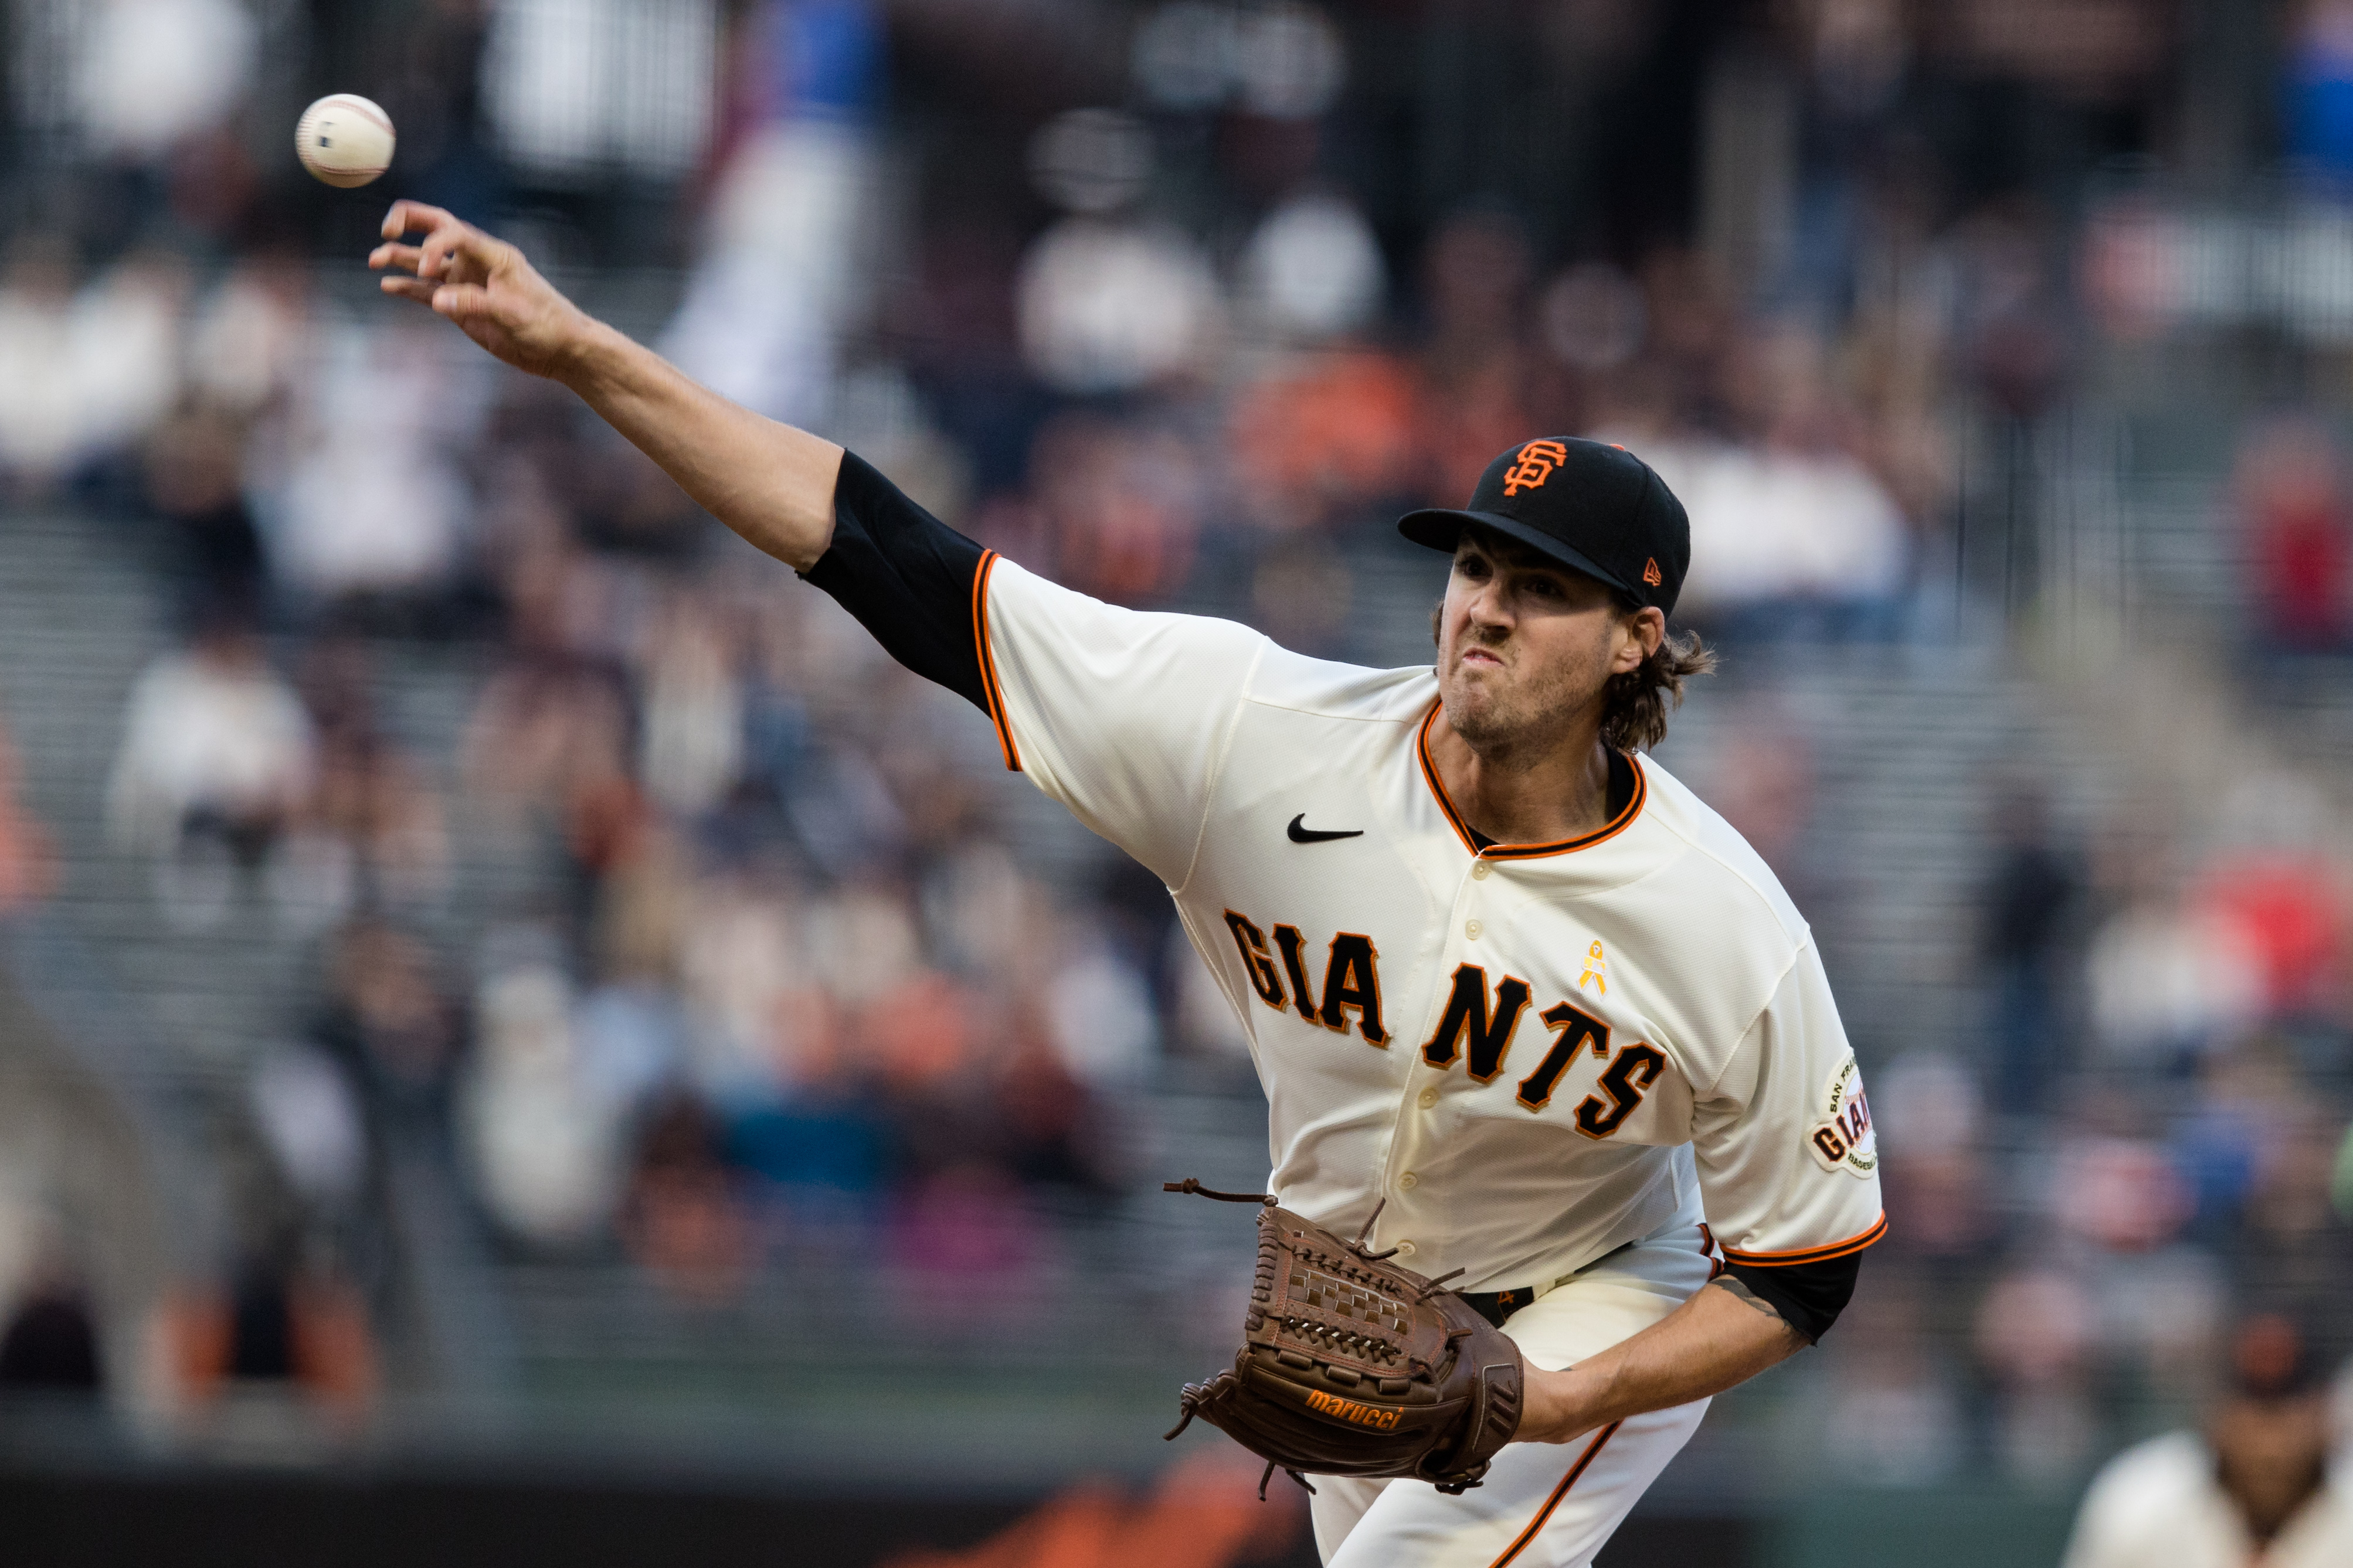 San Francisco Giants become first MLB team to reach 2021 postseason